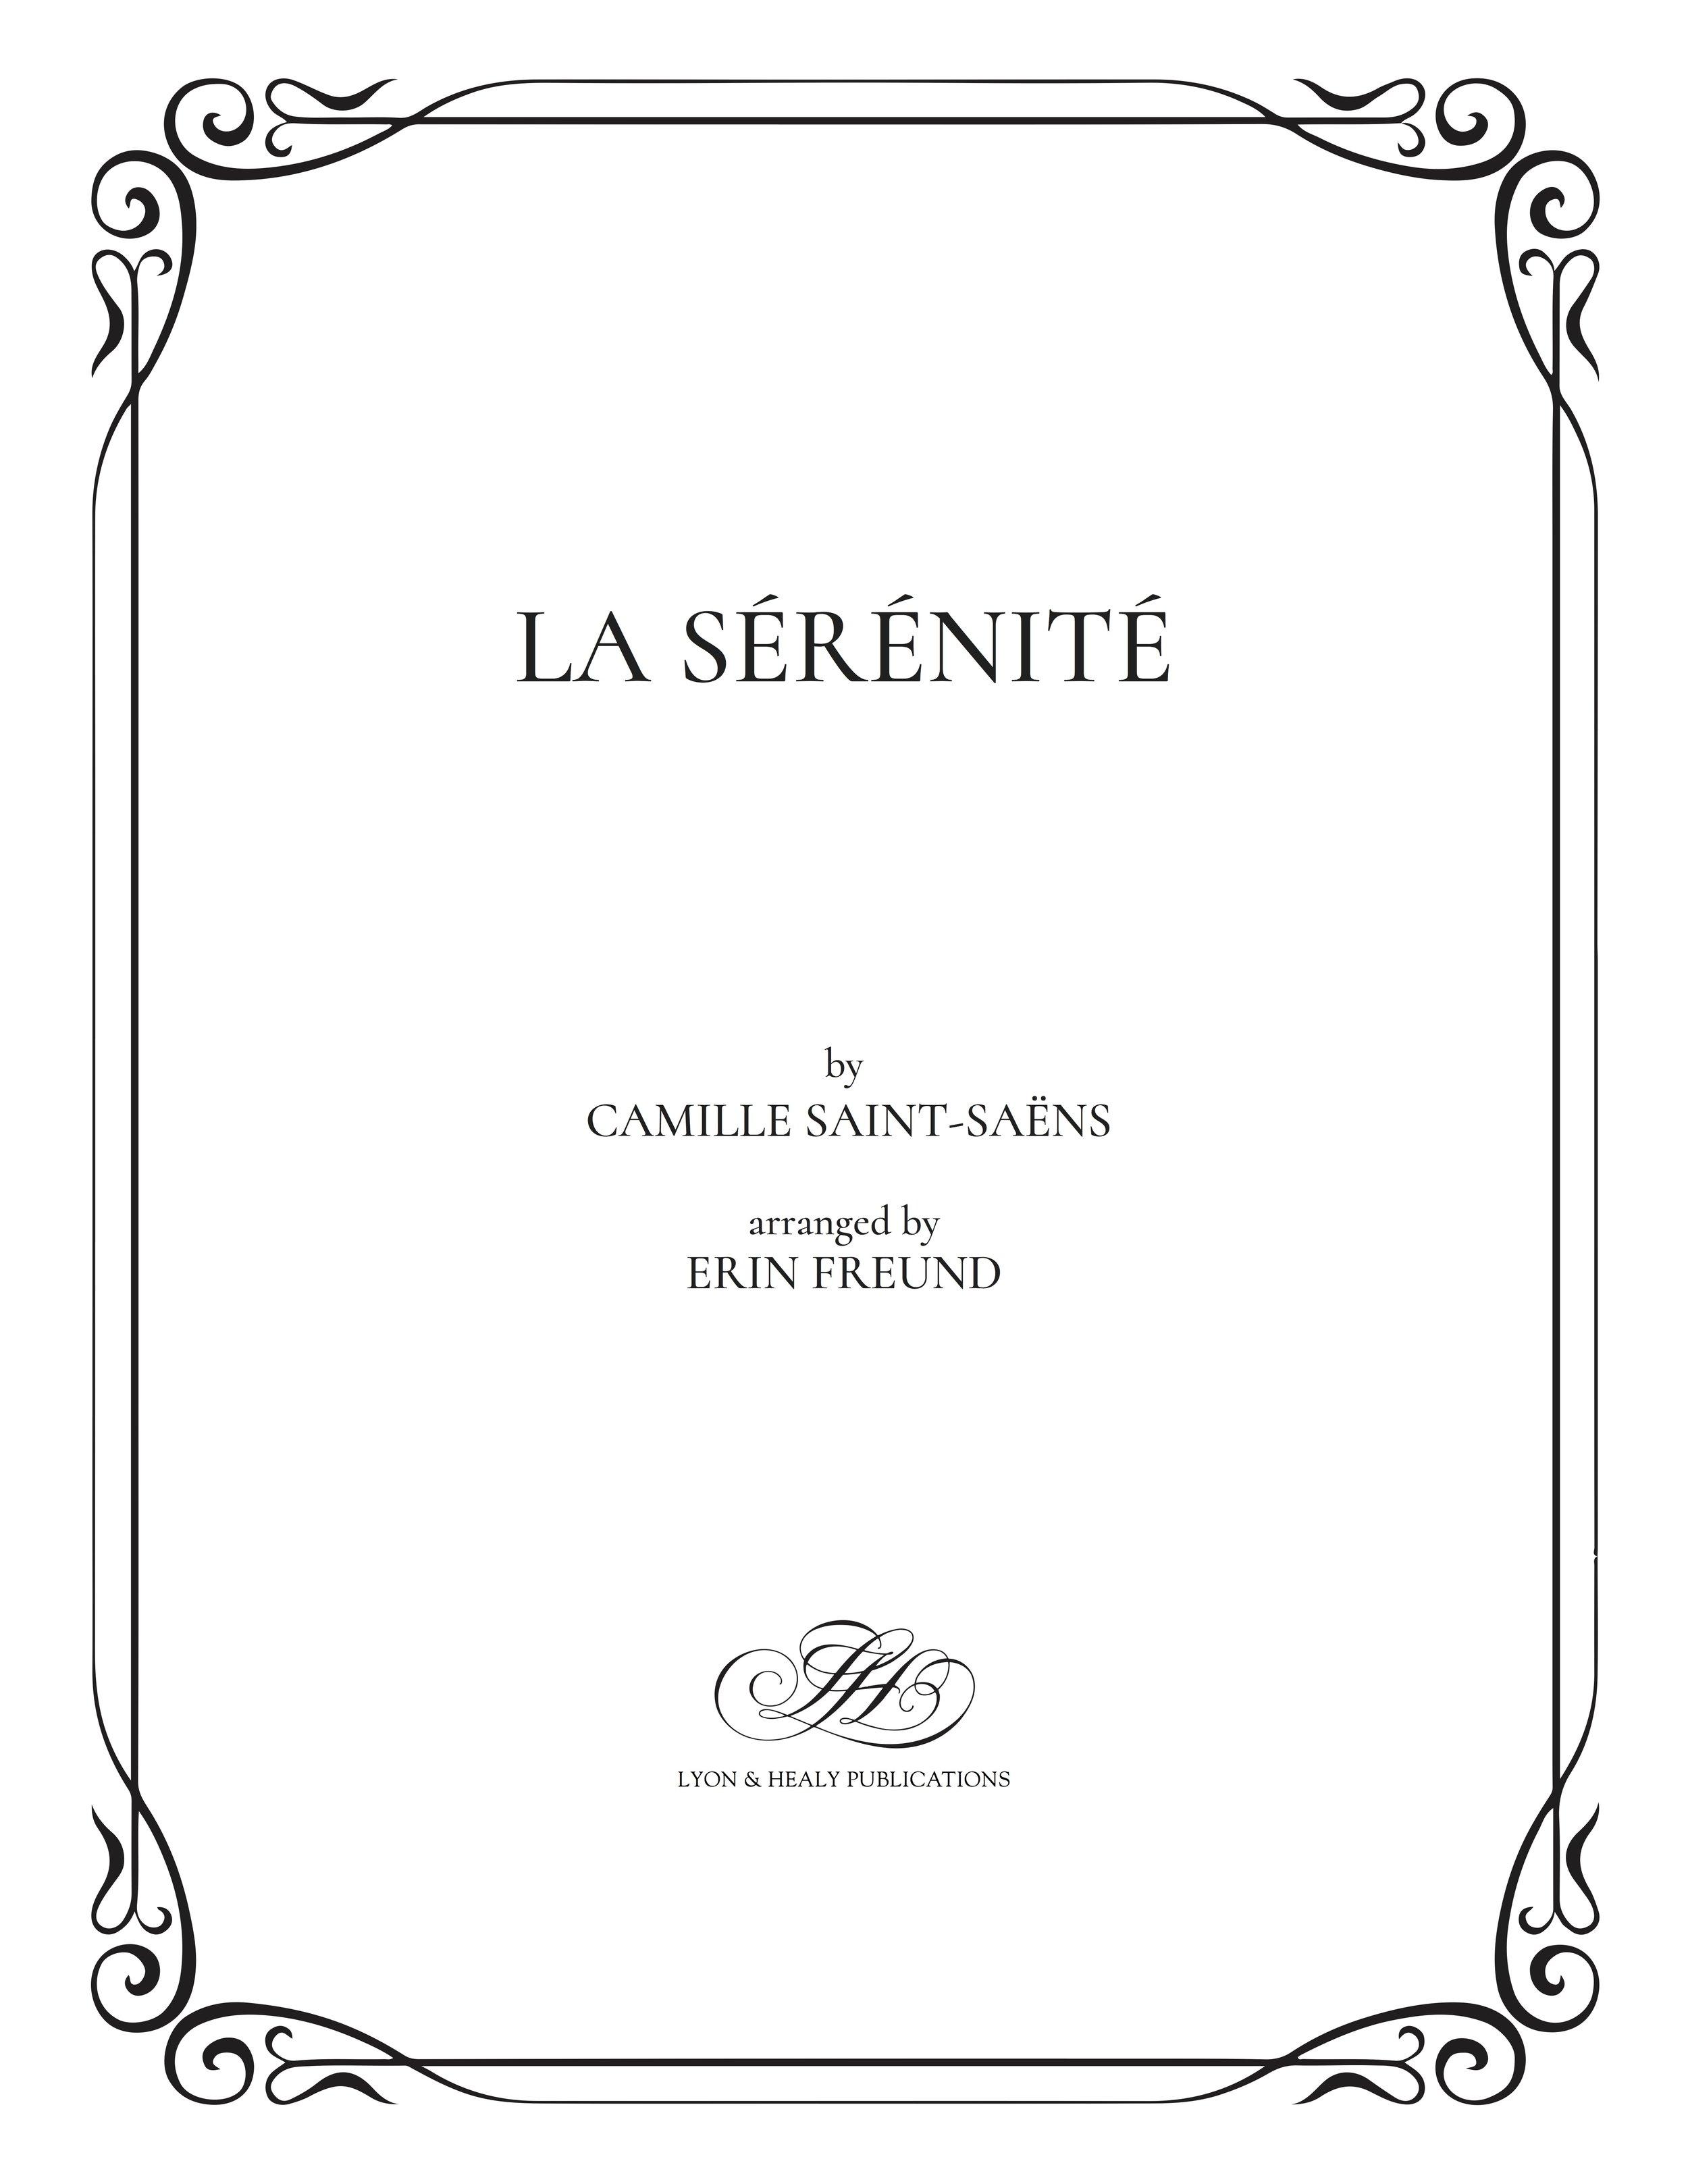 La Sérénité - Saint-Saëns - Freund cover.jpg